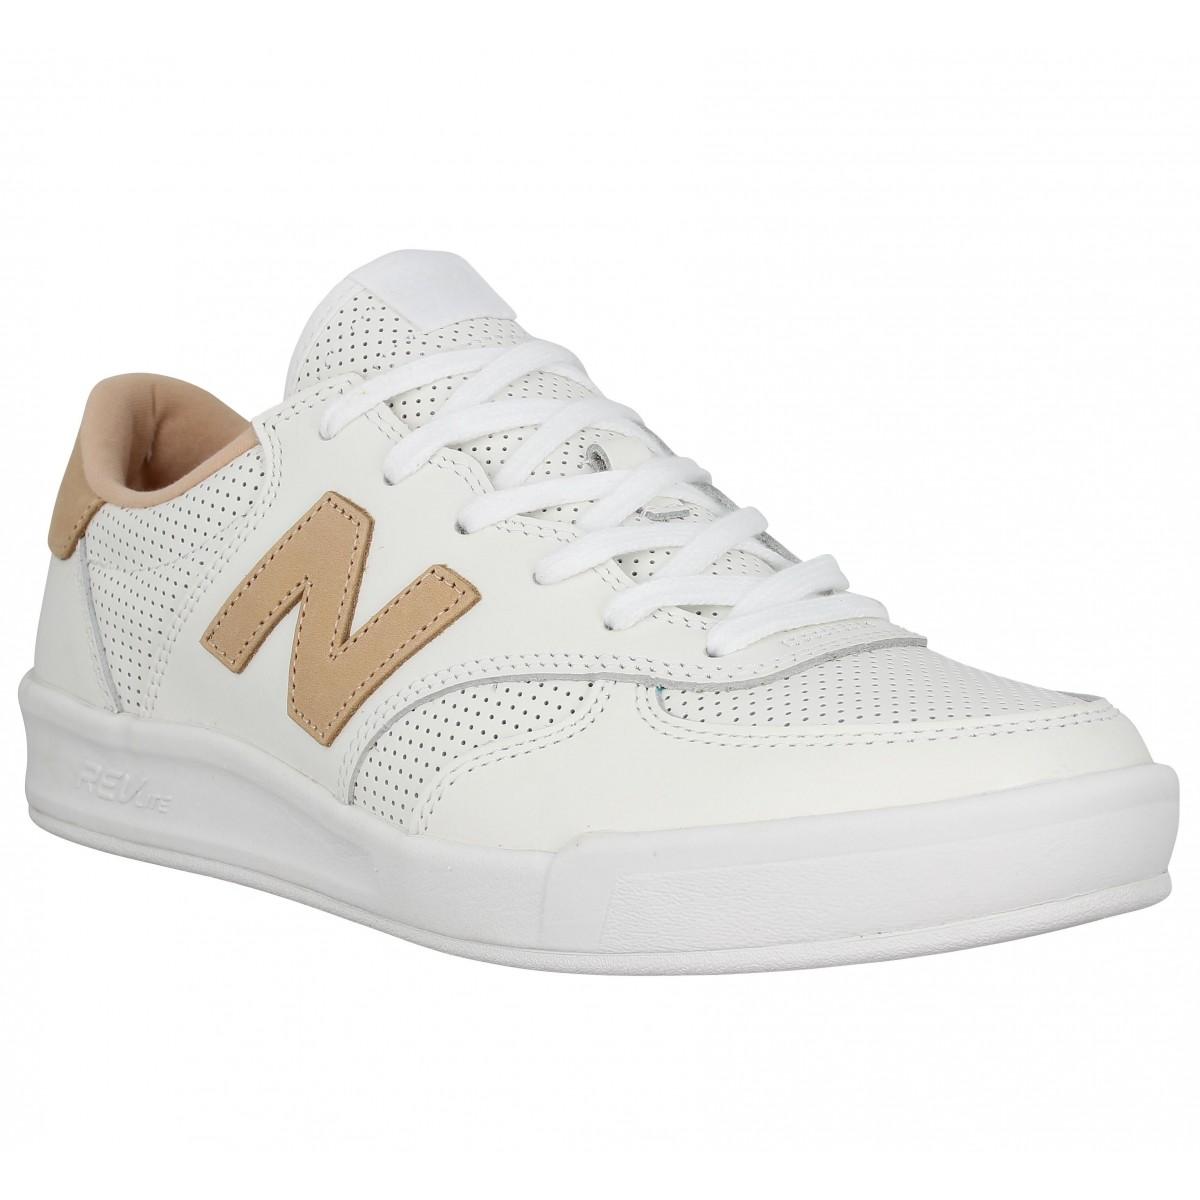 New Balance Homme Crt300 Cuir -40-white